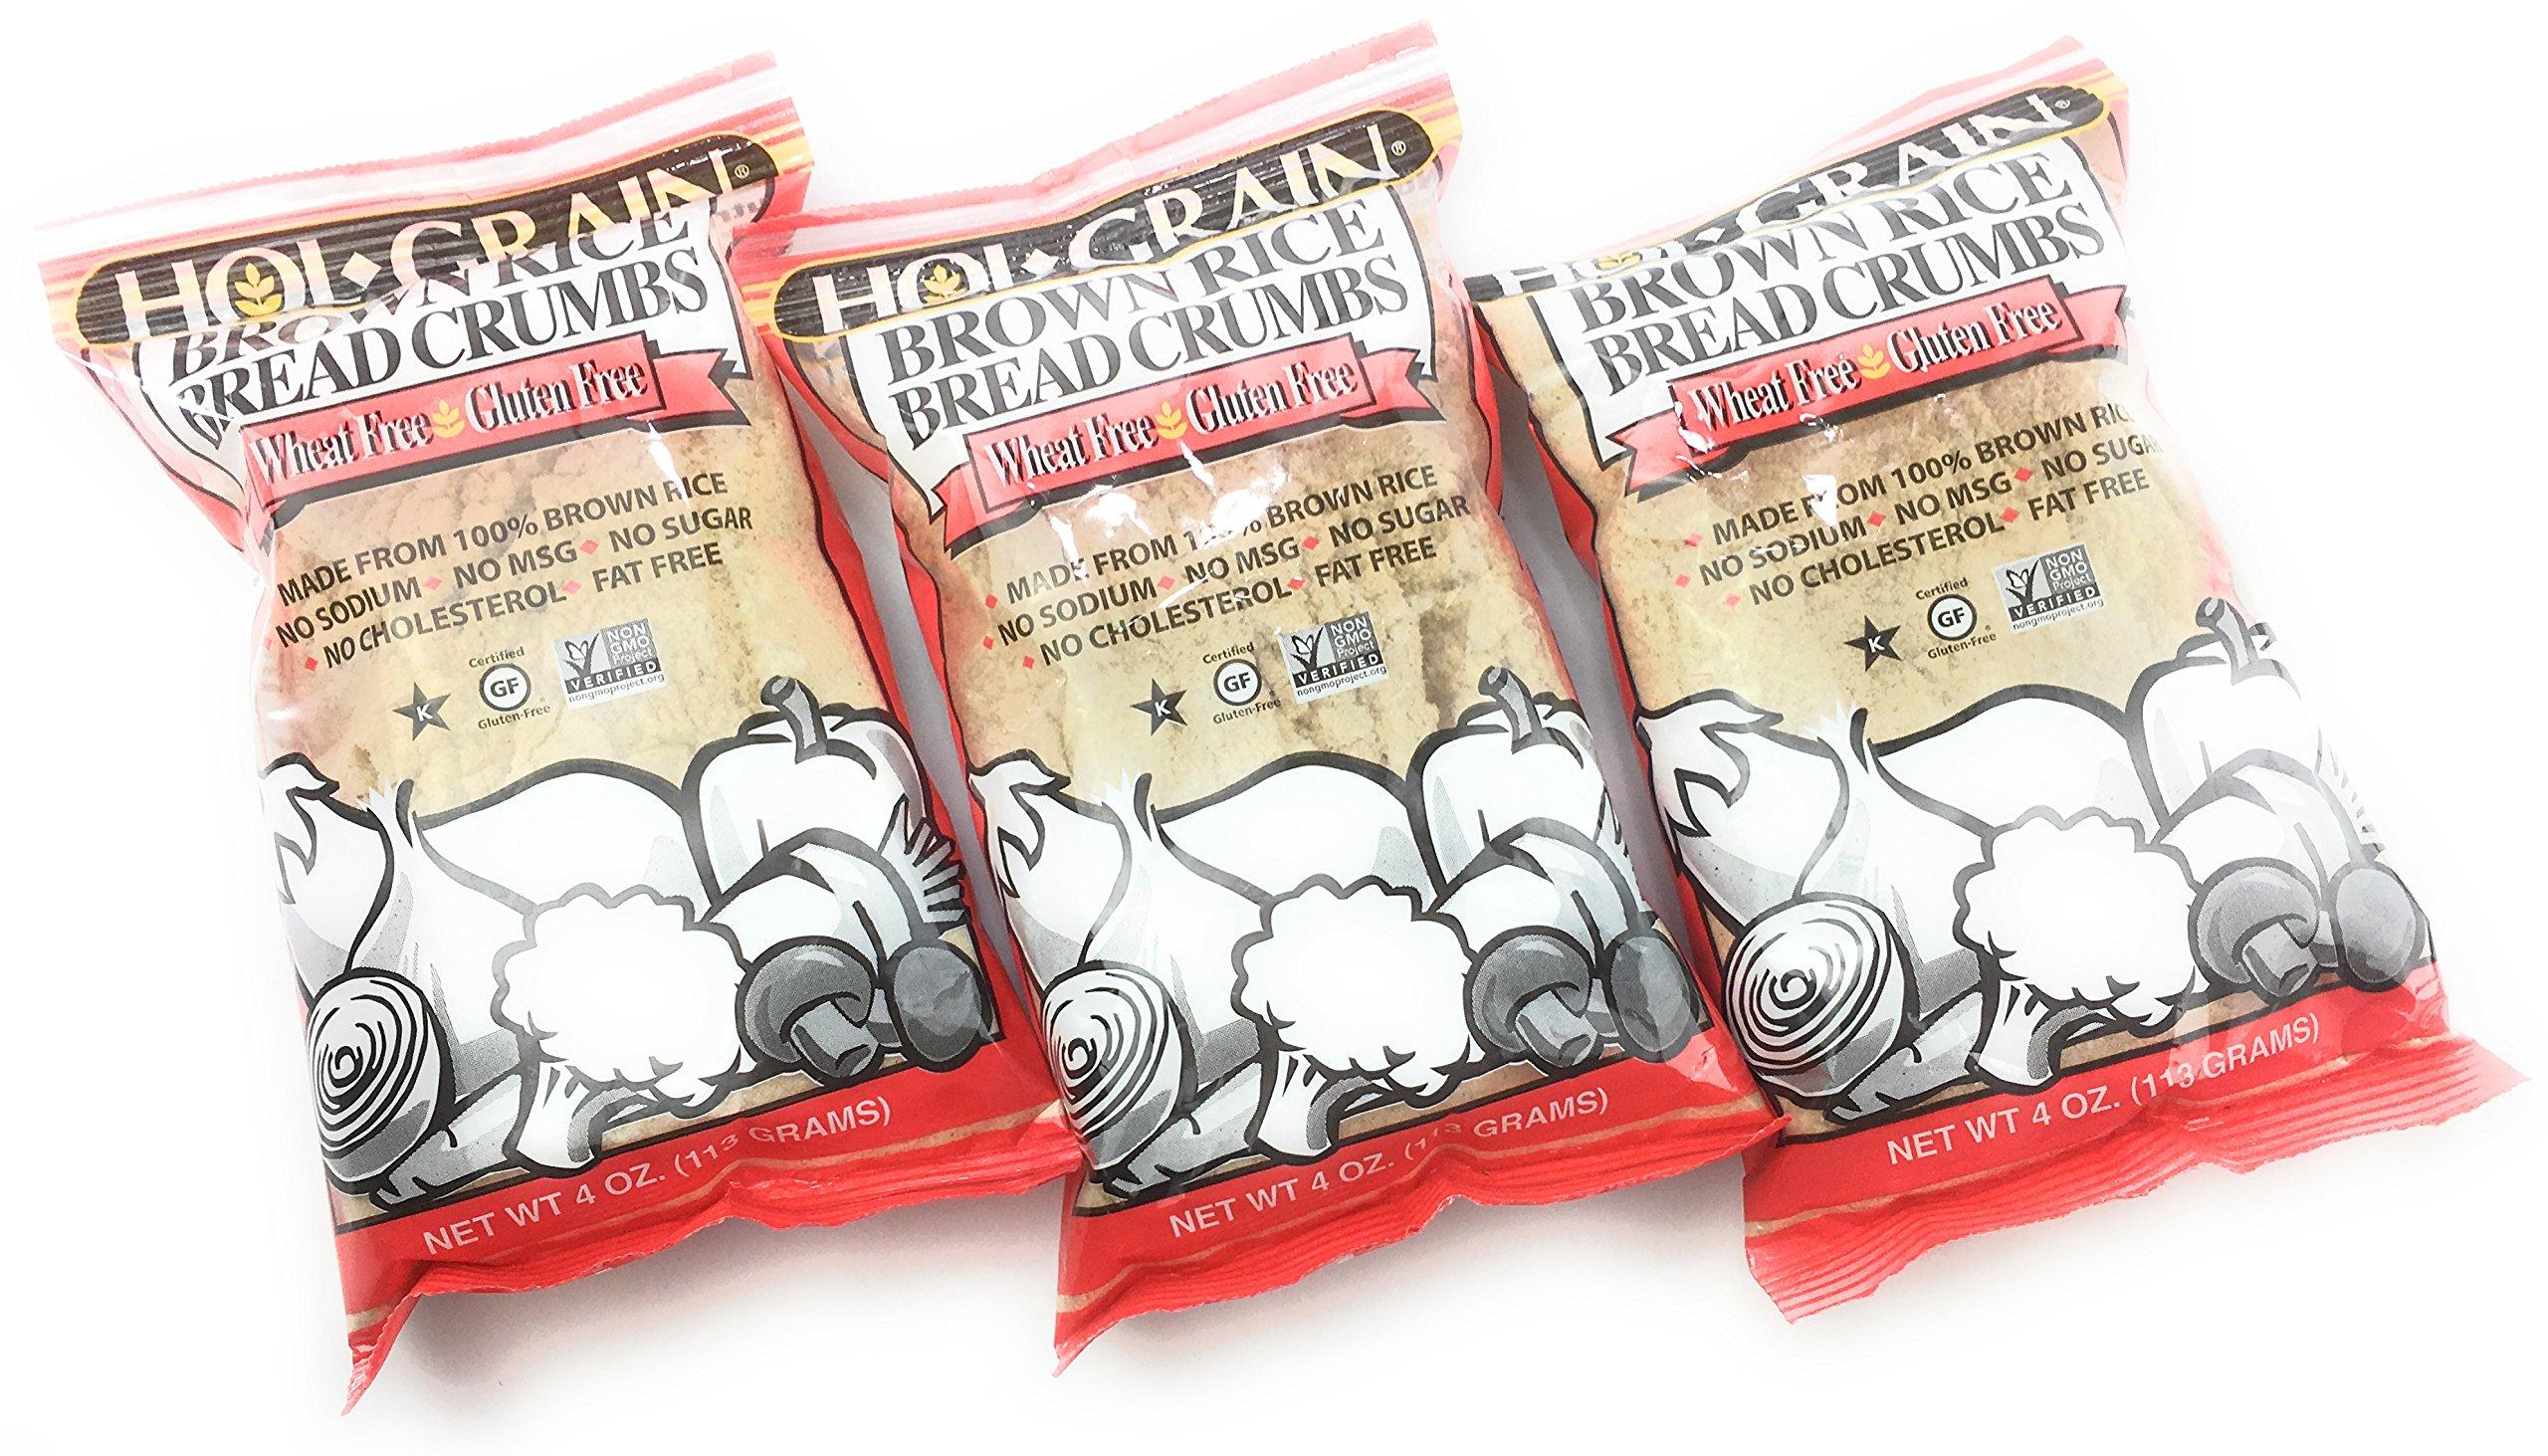 HOL GRAIN Brown Rice Bread Crumbs, 4 OZ